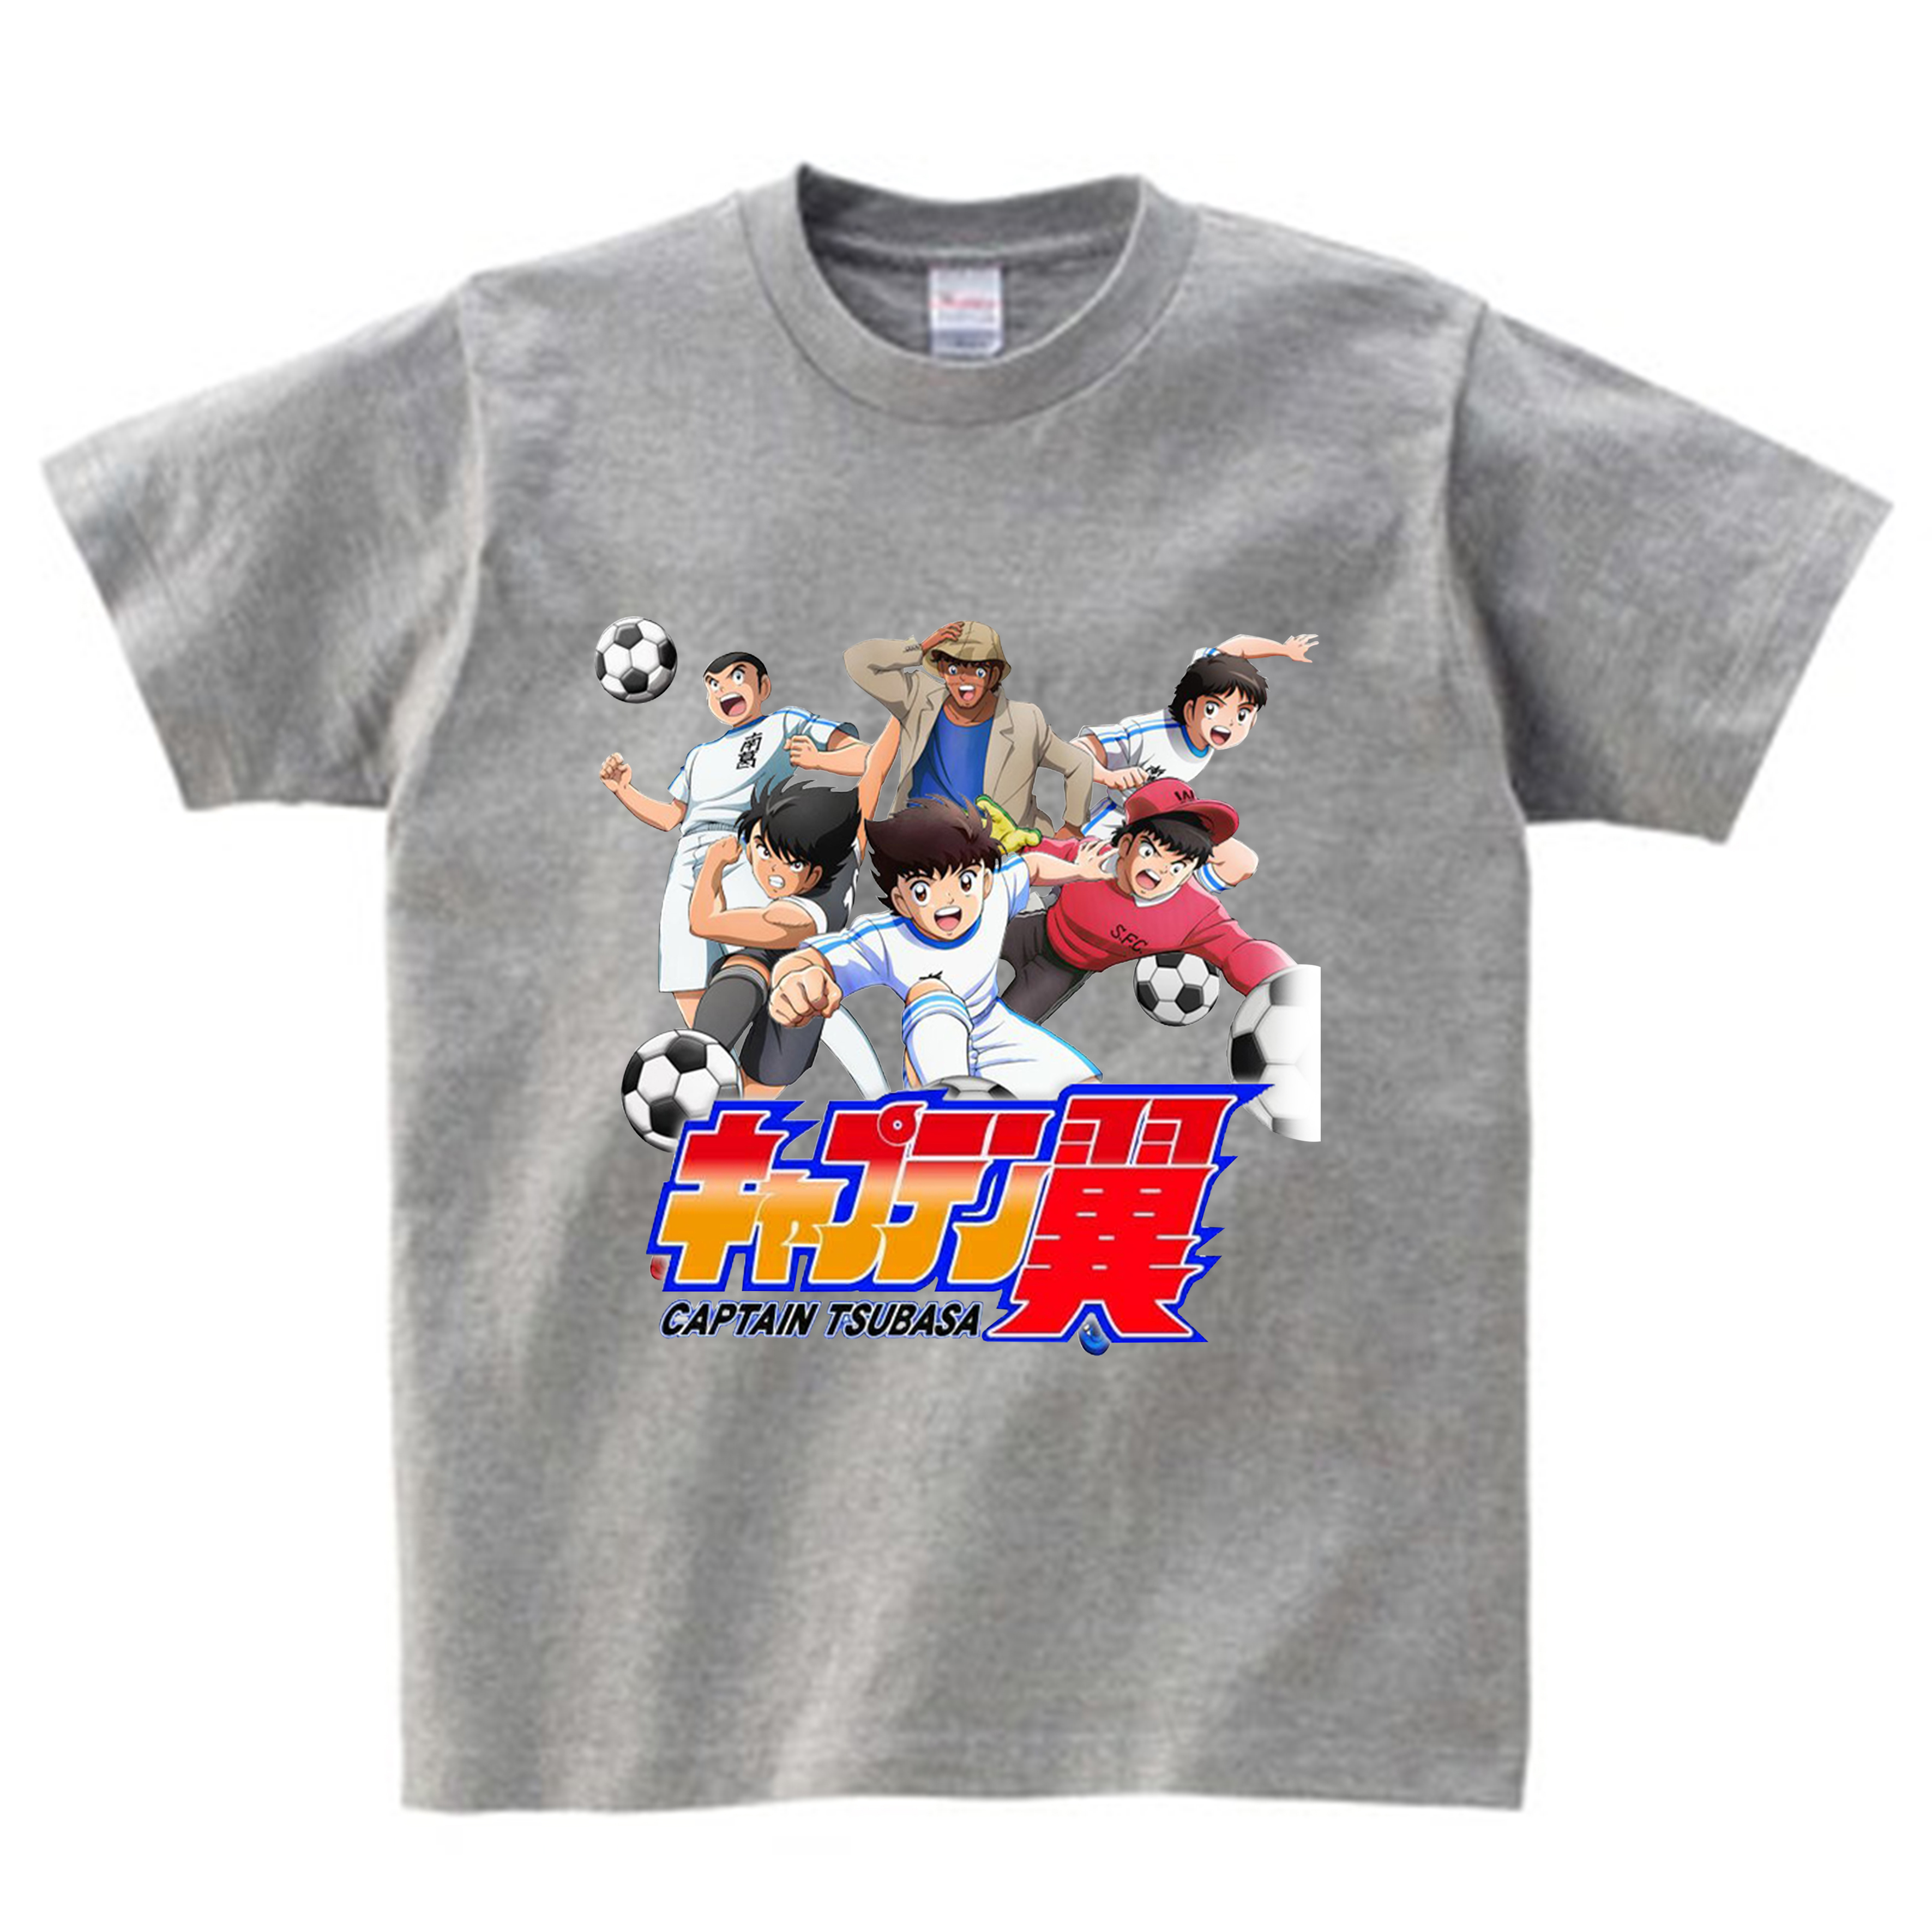 Anime Captain Tsubasa T Shirt Children Summer Leisure Short Sleeve t shirt Boy Football Motion T-shirts For Boys Girls Top 3T-9T 4